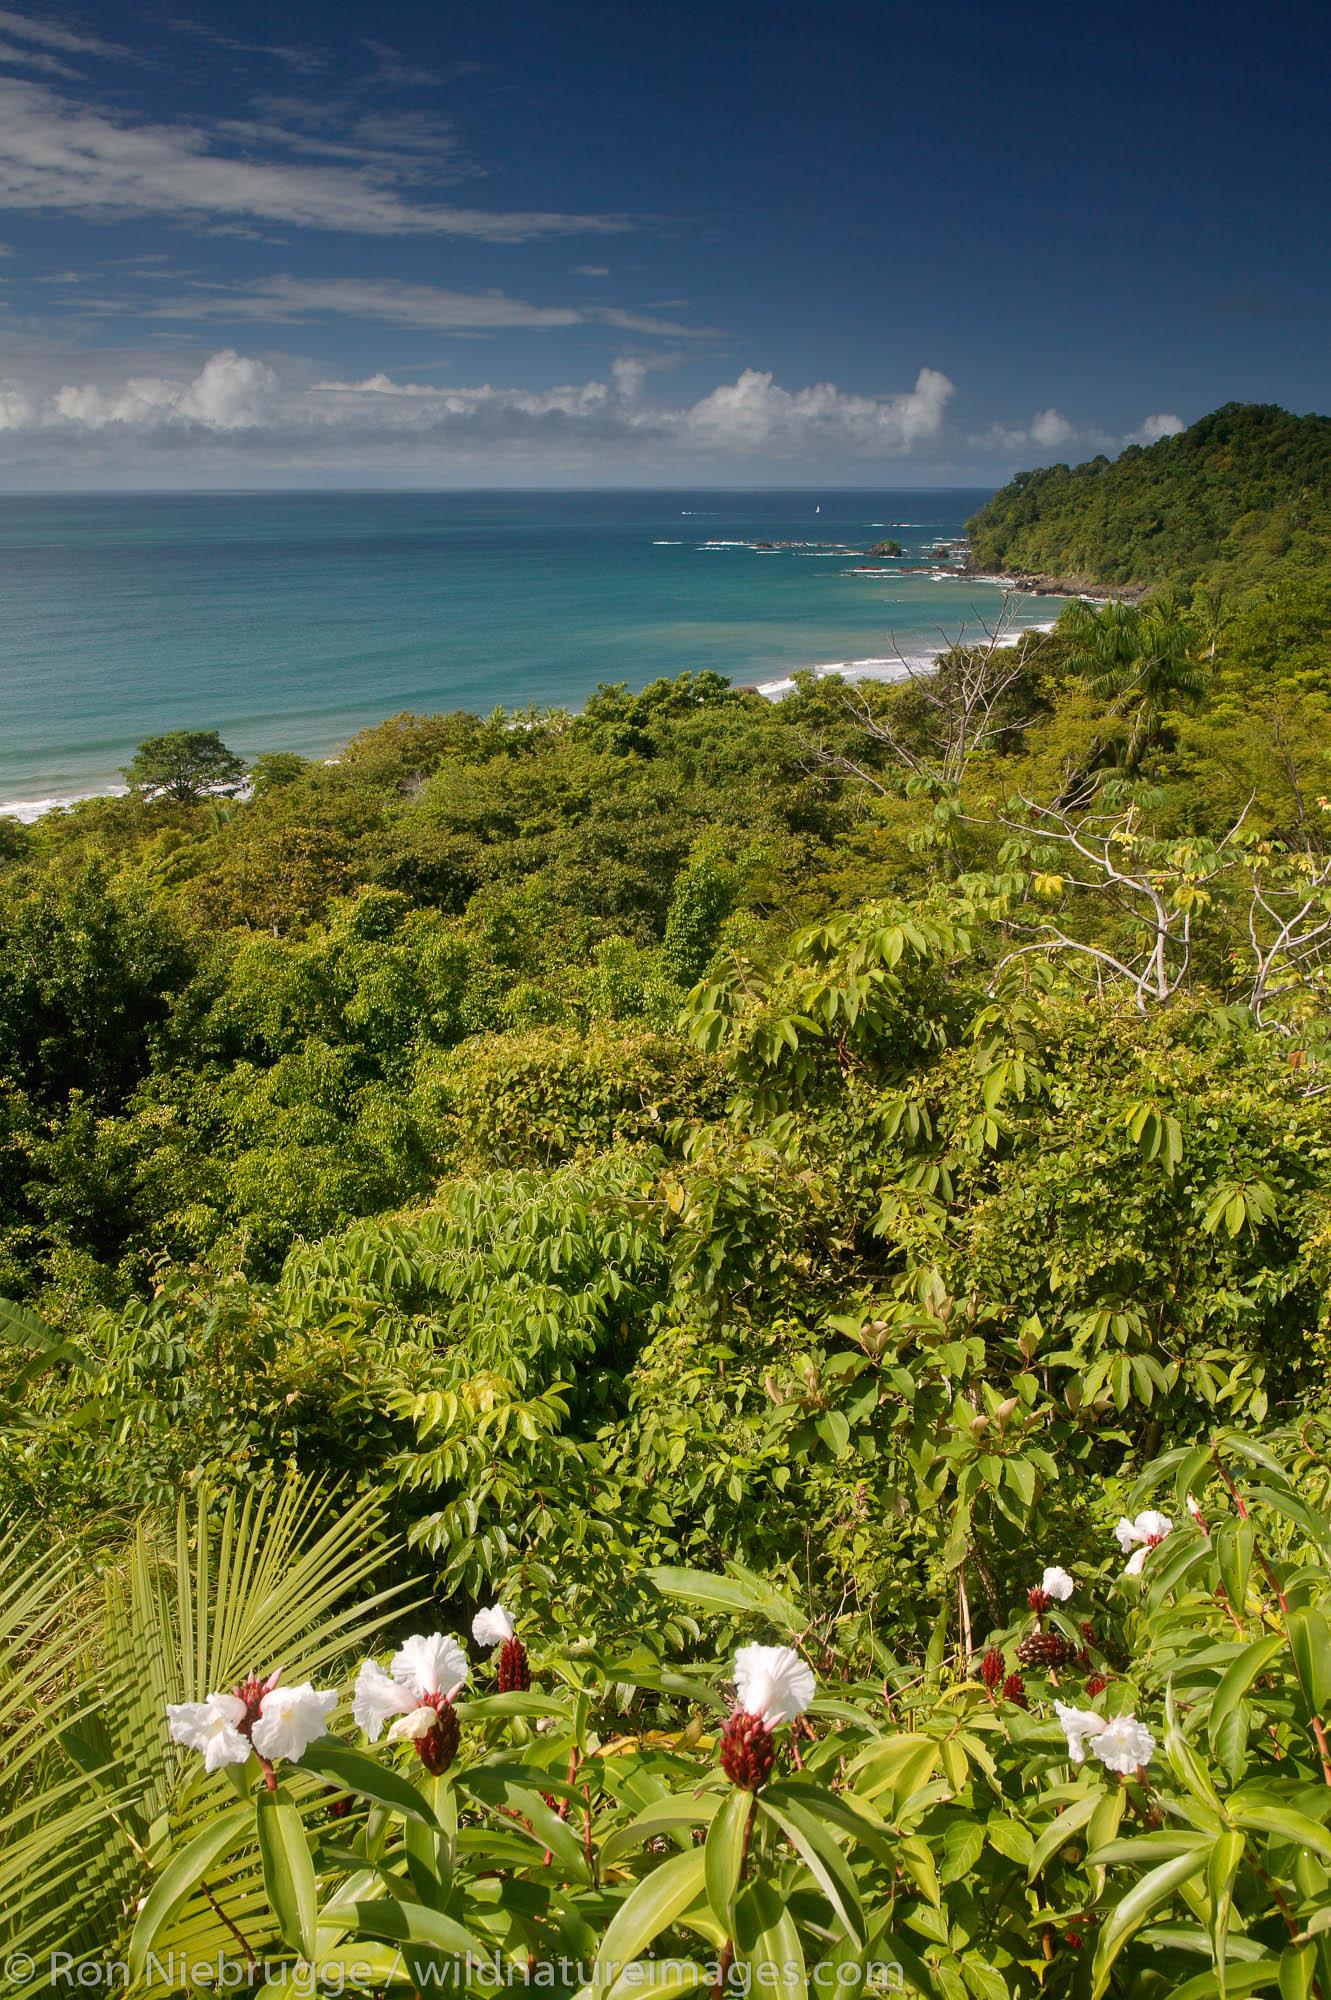 The Pacific Ocean from Manuel Antonio, Costa Rica.